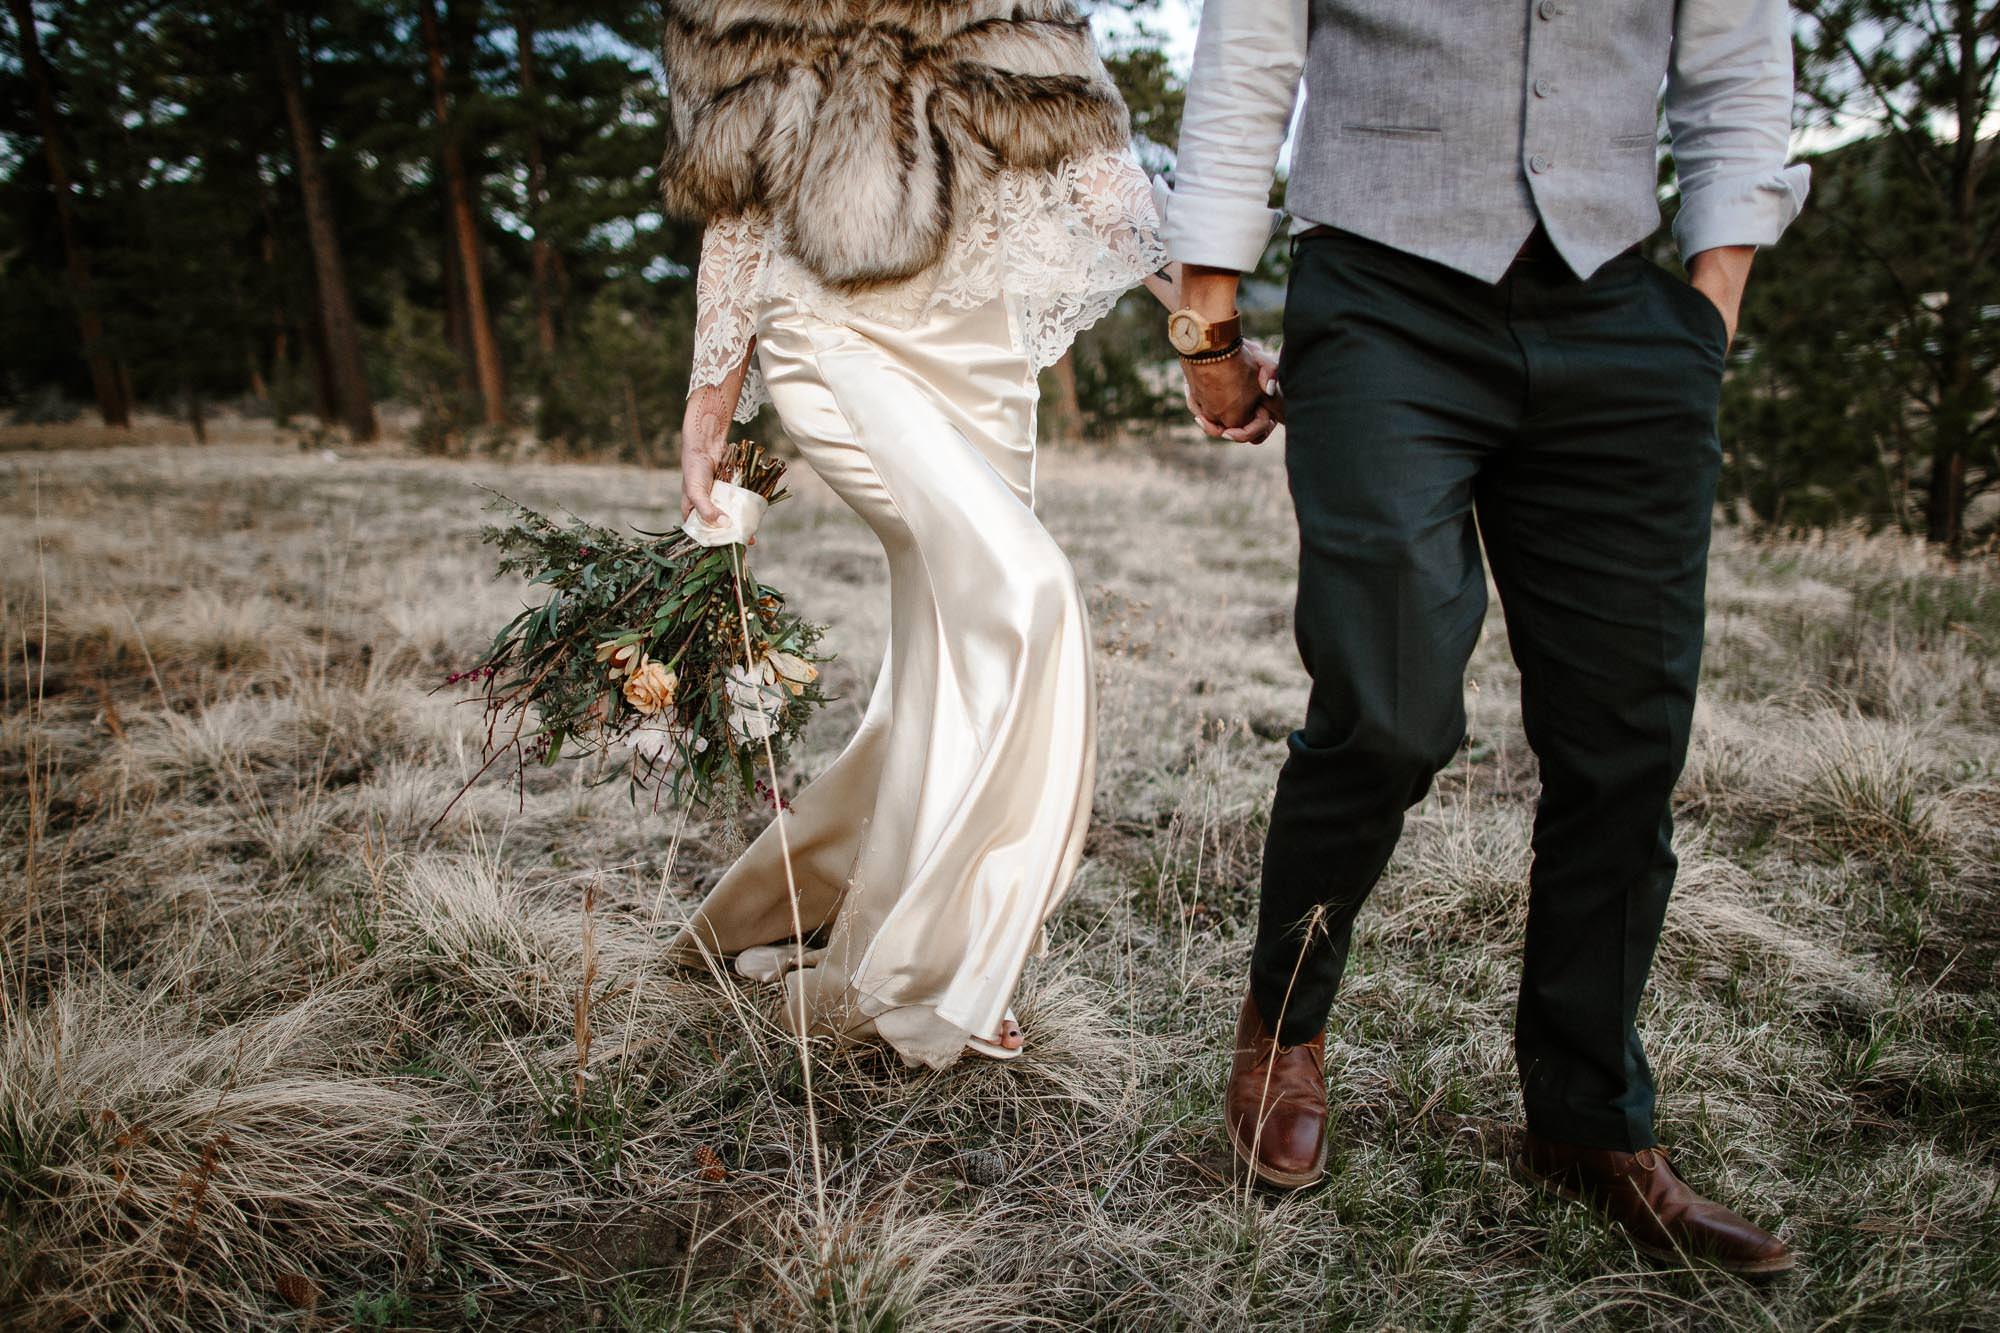 bucci-barn-wedding-elopement-evergreen-boulder-denver-colorado-adventerous-romantic-timeless-100.jpg